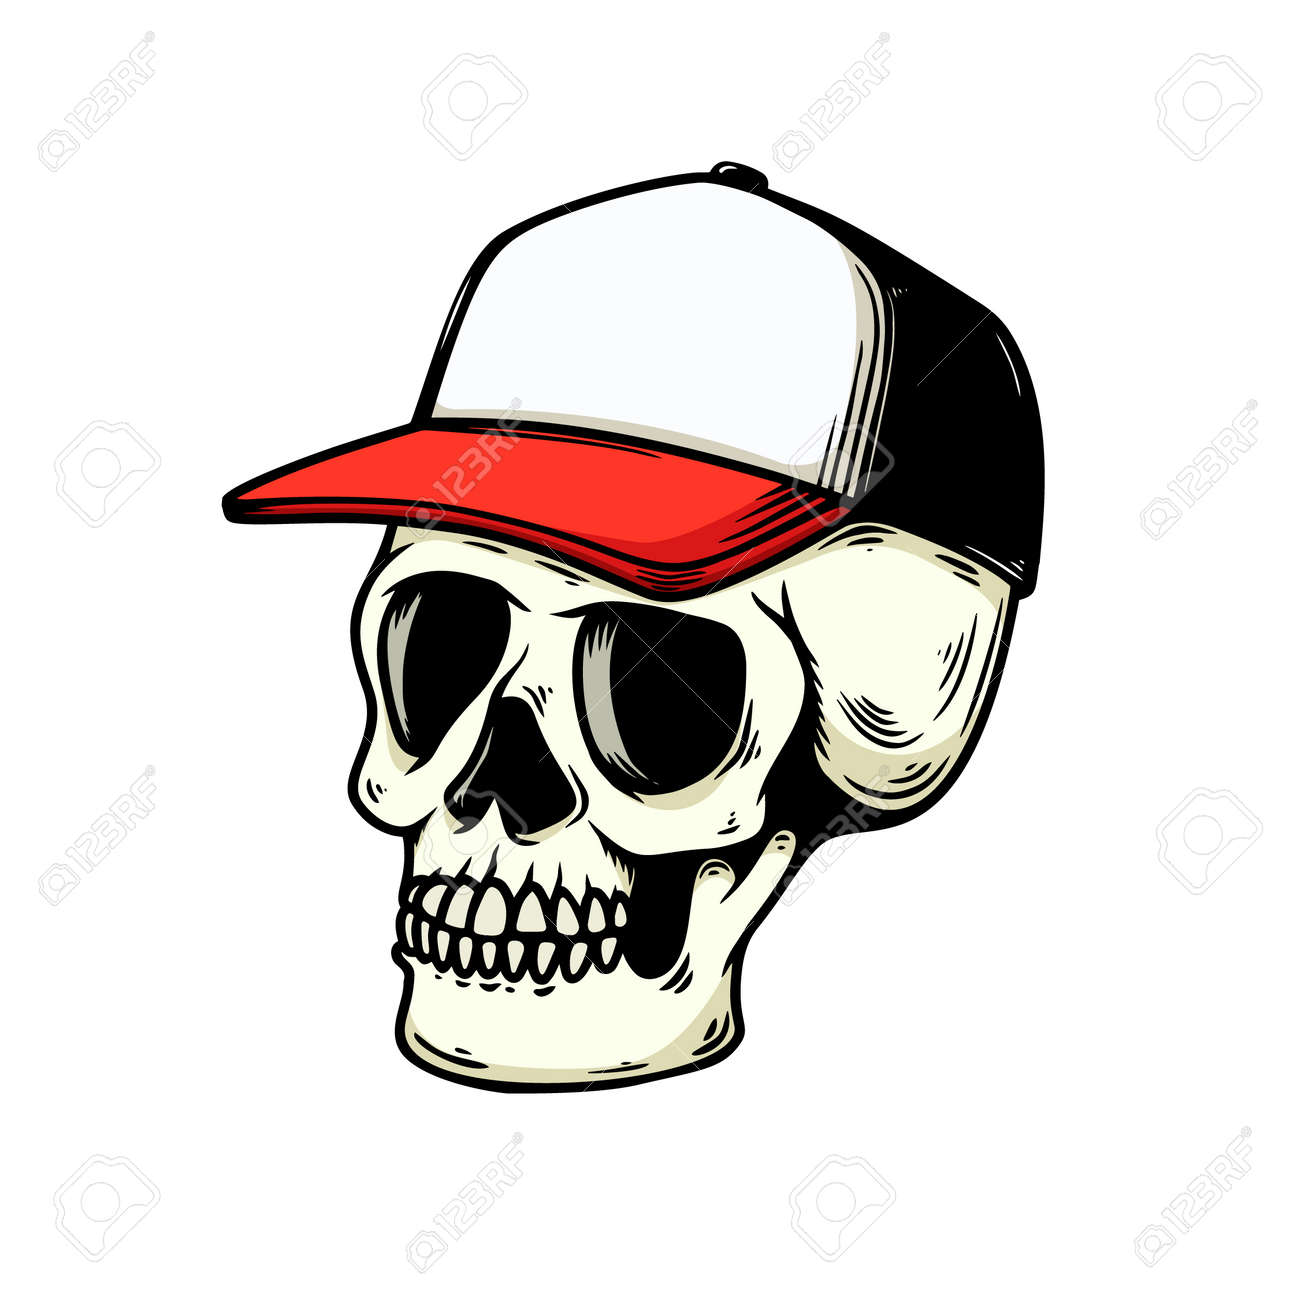 Illustration of human skull in baseball cap isolated on white background. Design element for logo, label, sign, emblem, poster. Vector illustration - 171625071